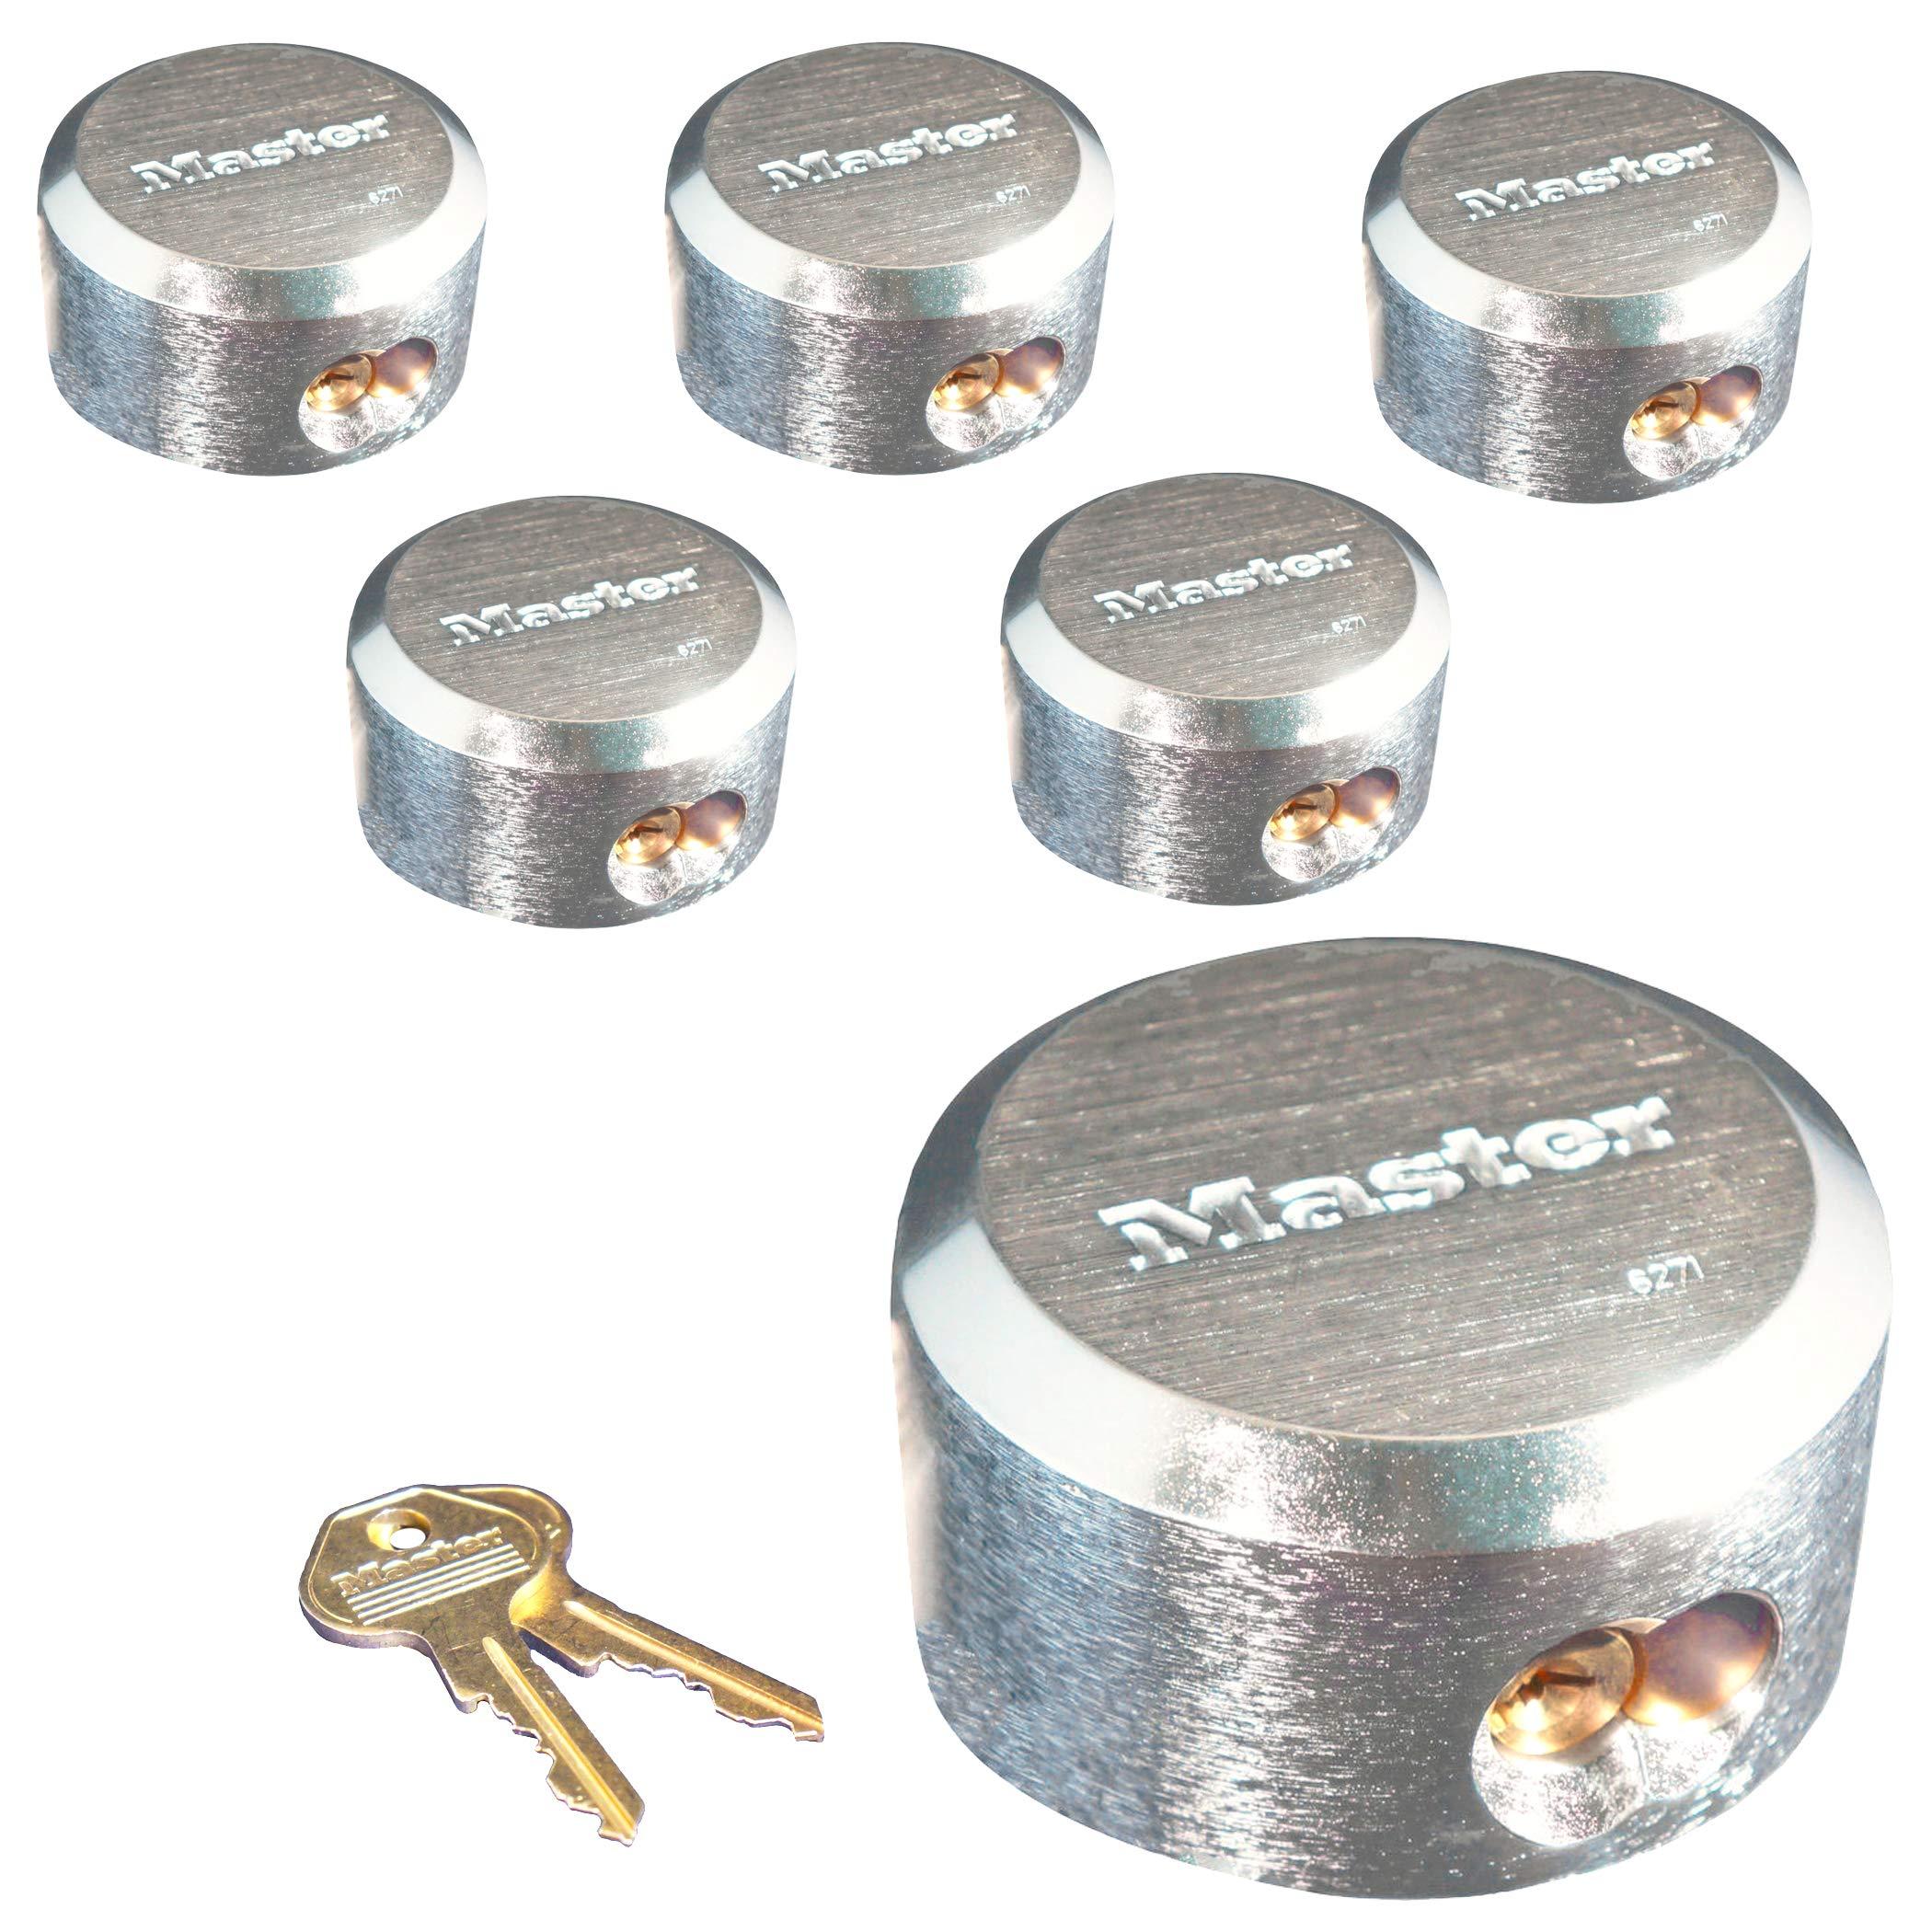 Master Lock Pro Series Hidden Shackle Padlocks, Keyed Alike 6271NKA-6 w/BumpStop Technology